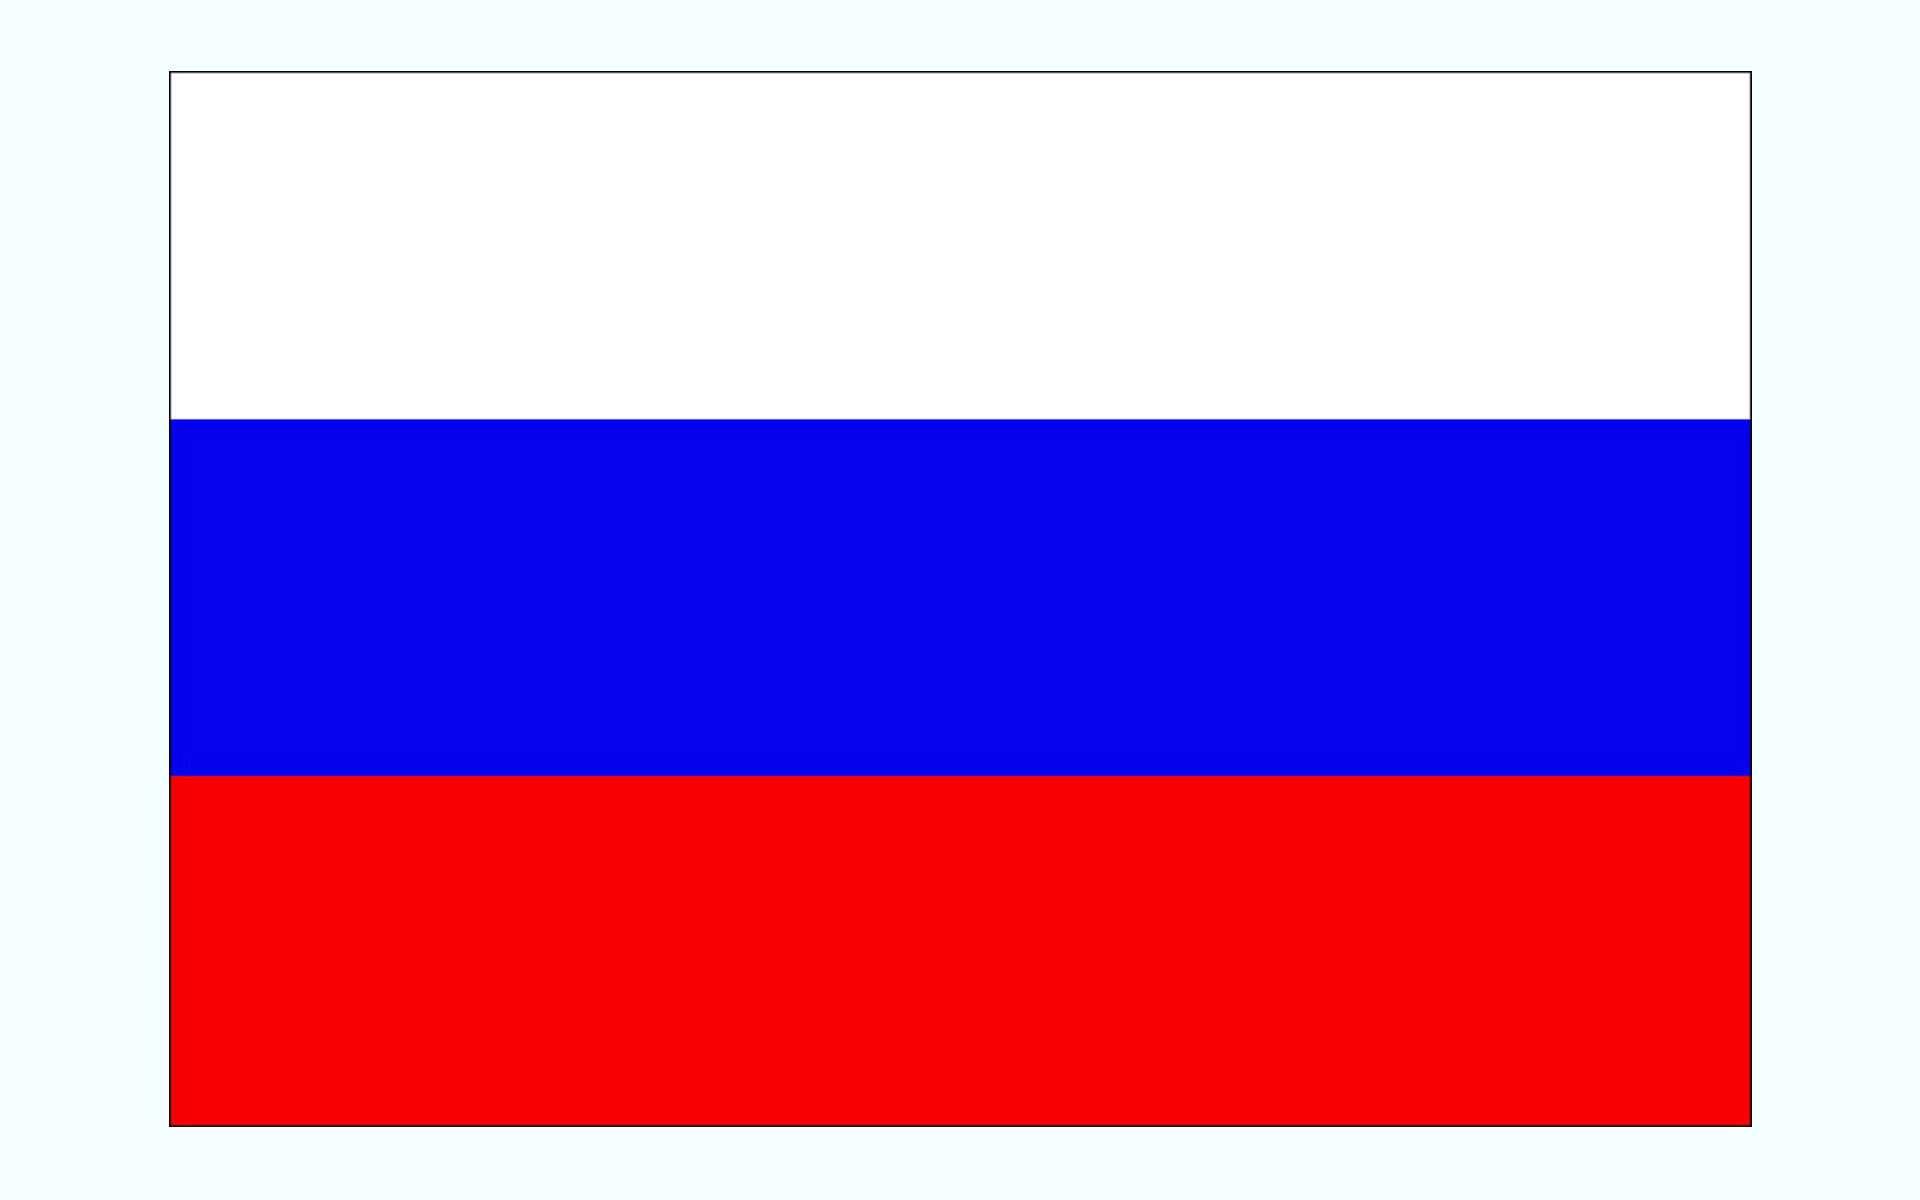 پرچم کشور روسيه